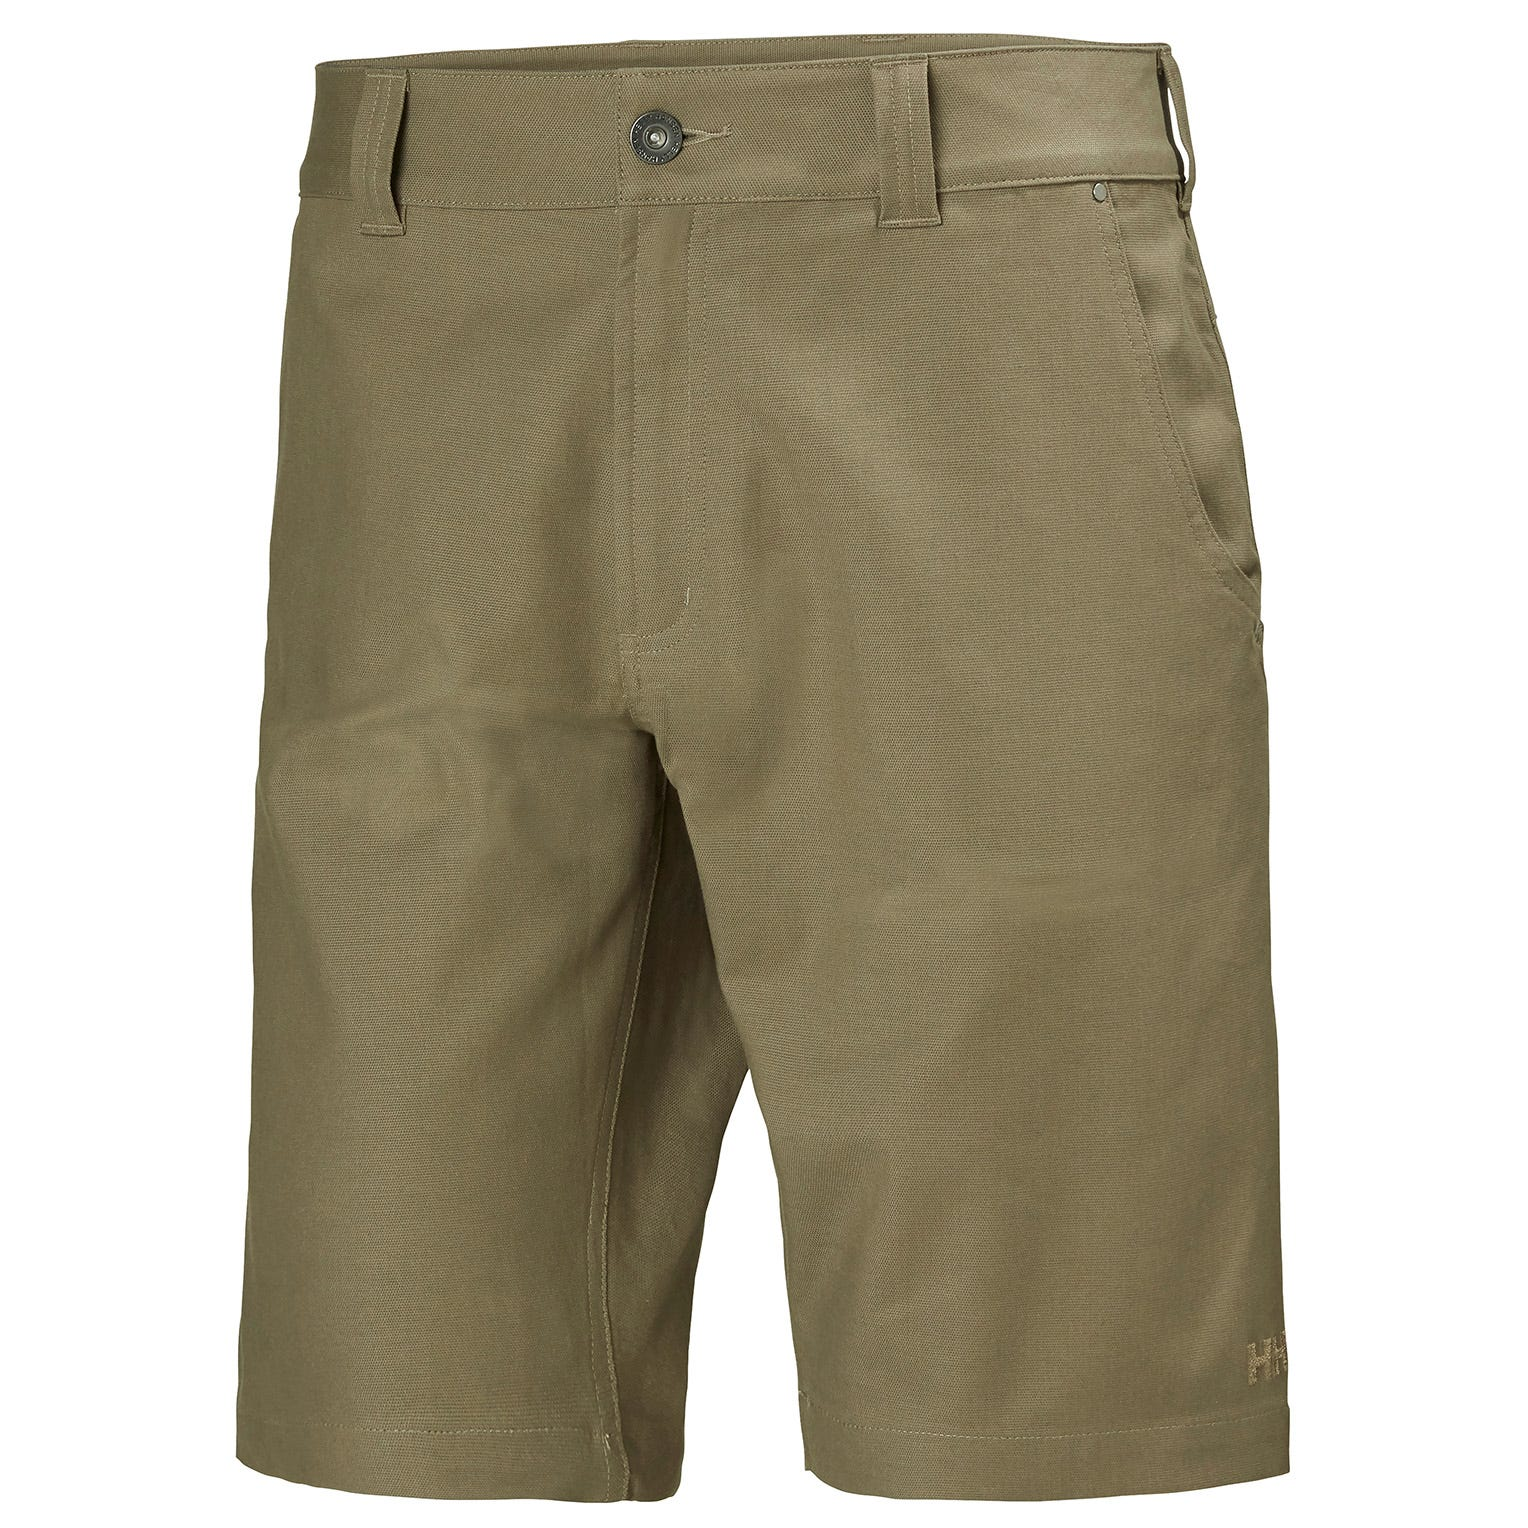 Mens Essential Canvas 5-pocket Hiking Shorts | Uk Helly Hansen Mens Trouser Beige L